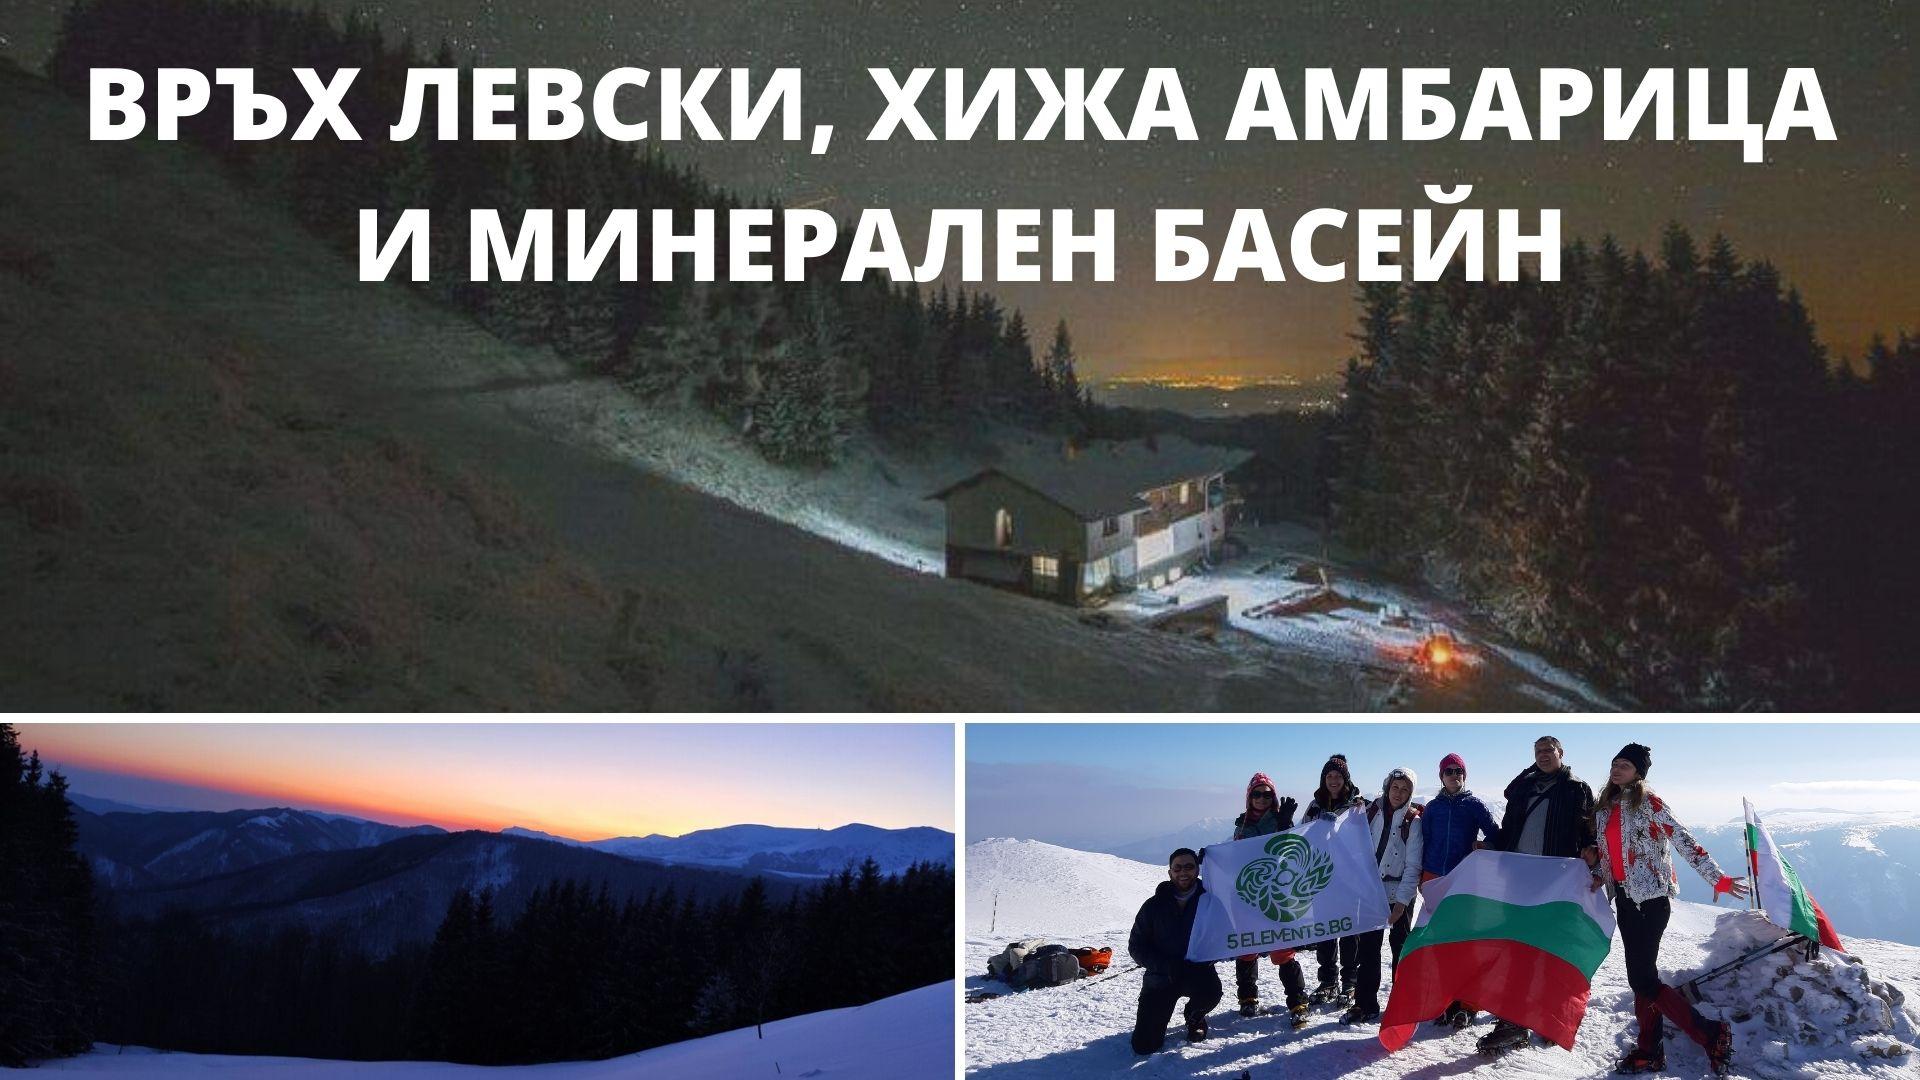 ВРЪХ ЛЕВСКИ, ХИЖА АМБАРИЦА И МИНЕРАЛЕН БАСЕЙН